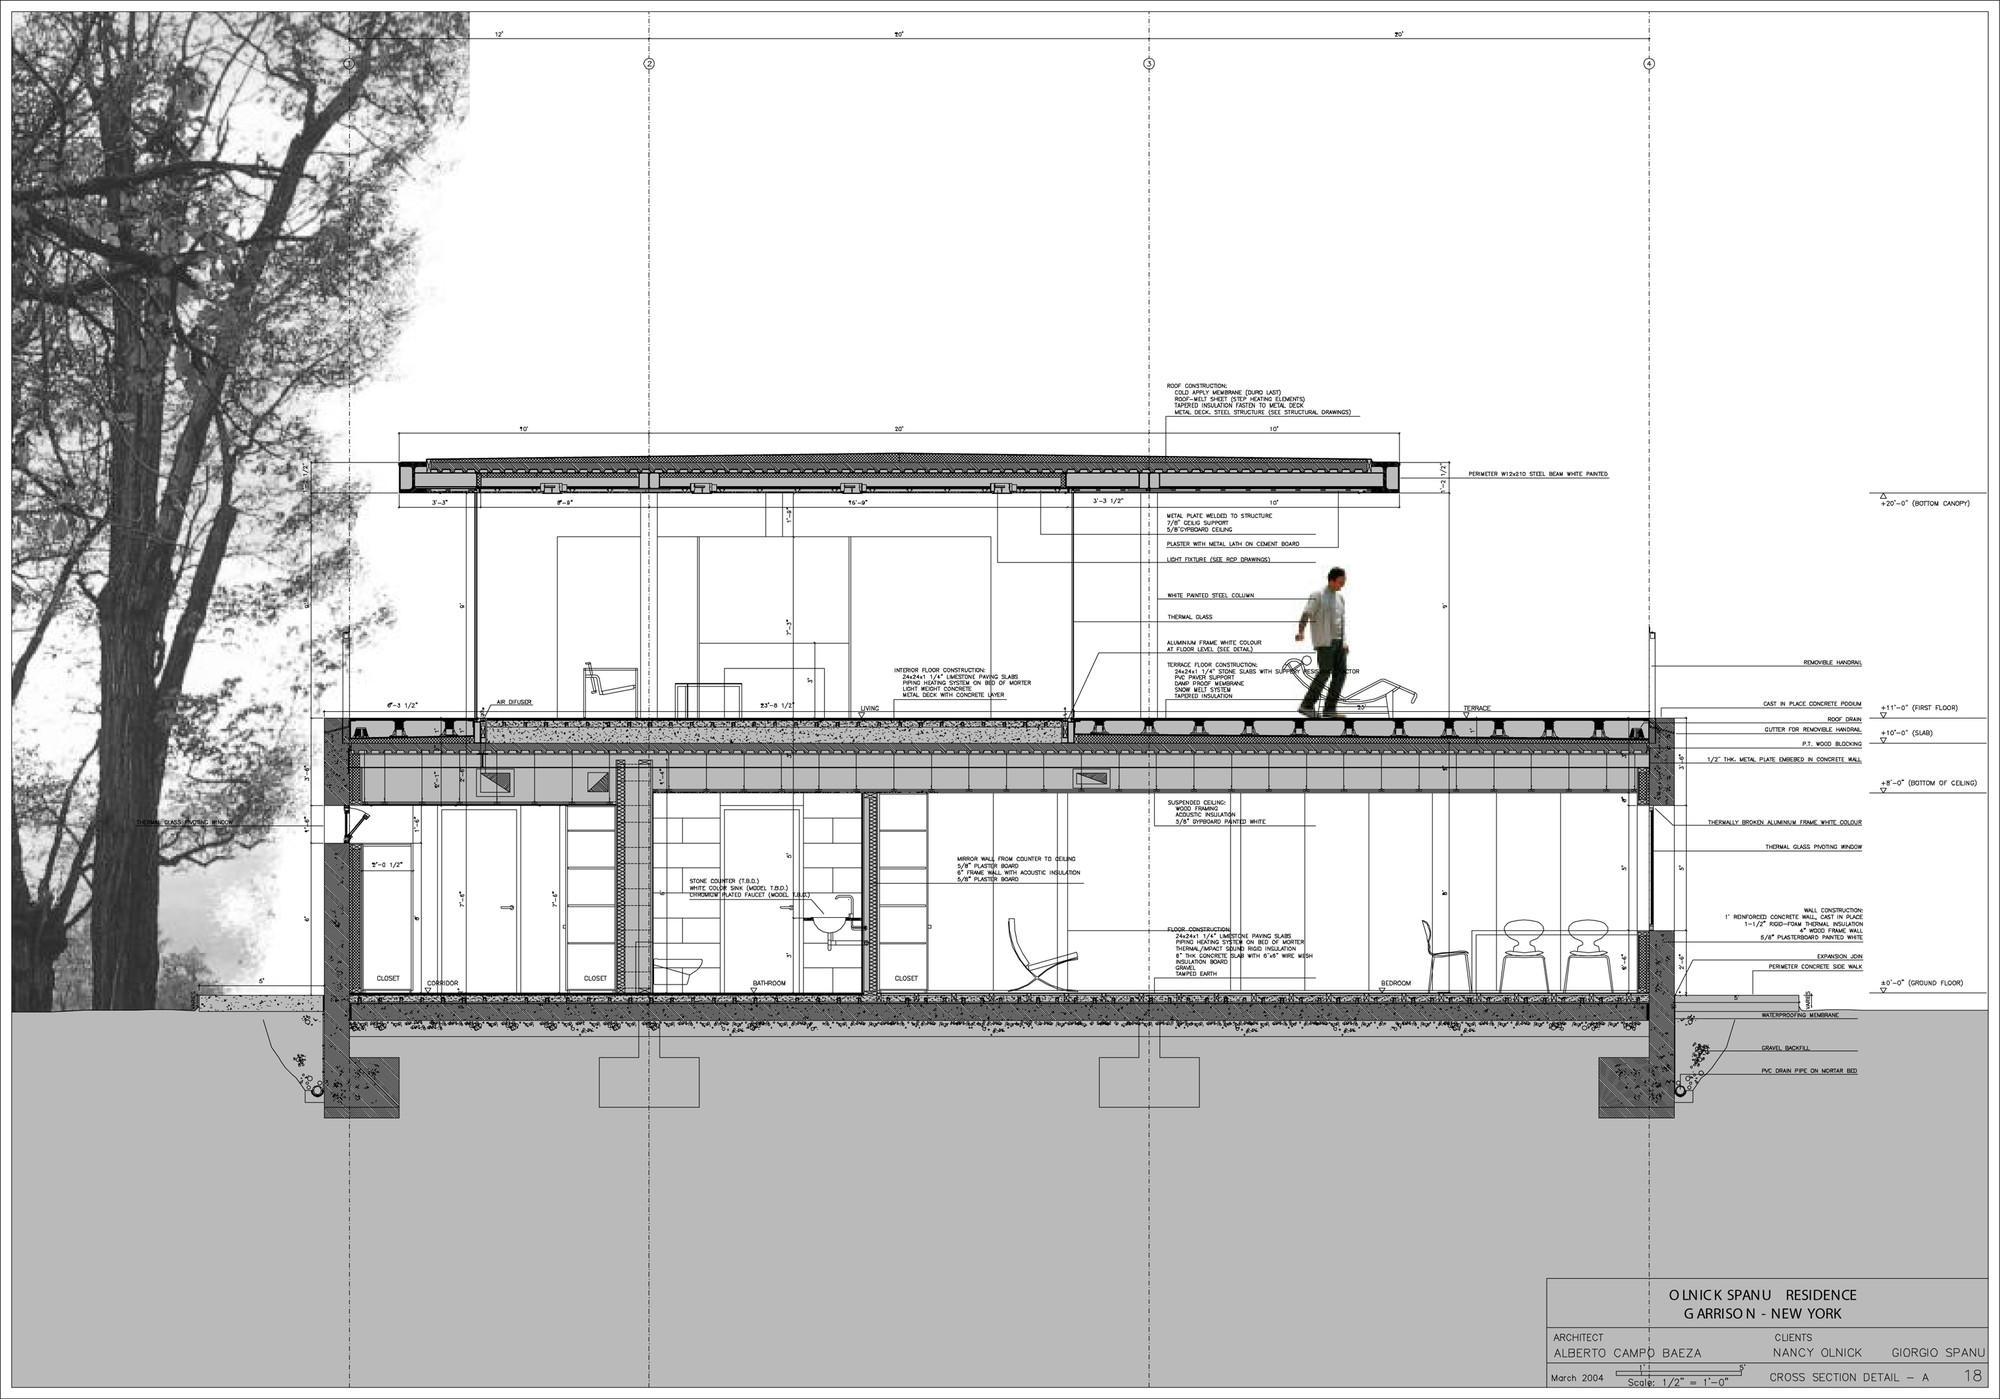 Galer 237 A De Casa Olnick Spanu Estudio Arquitectura Campo